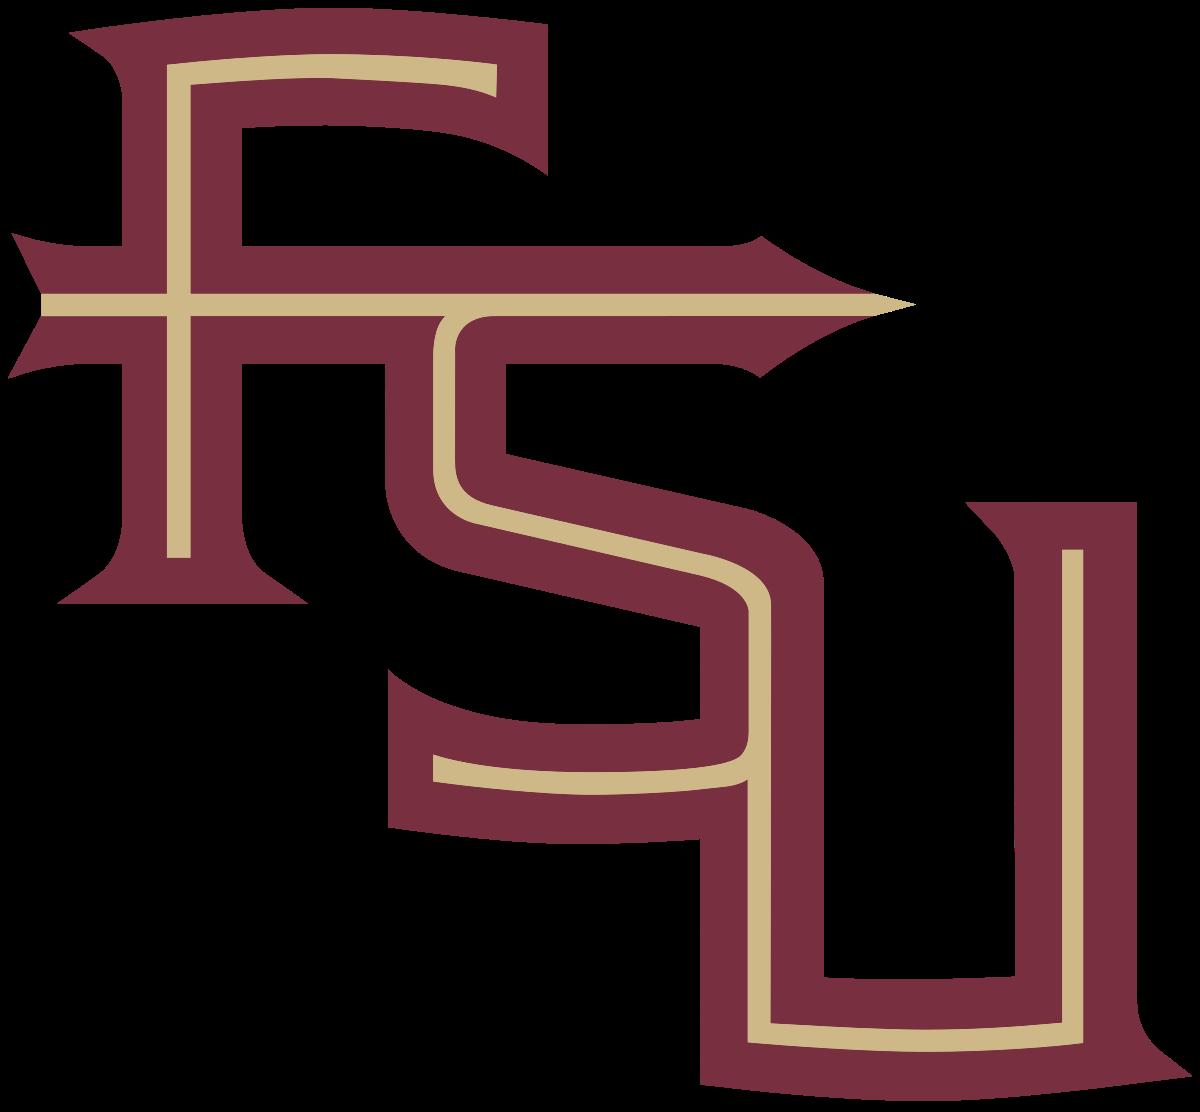 Florida clipart seminole tribe. State seminoles football wikipedia